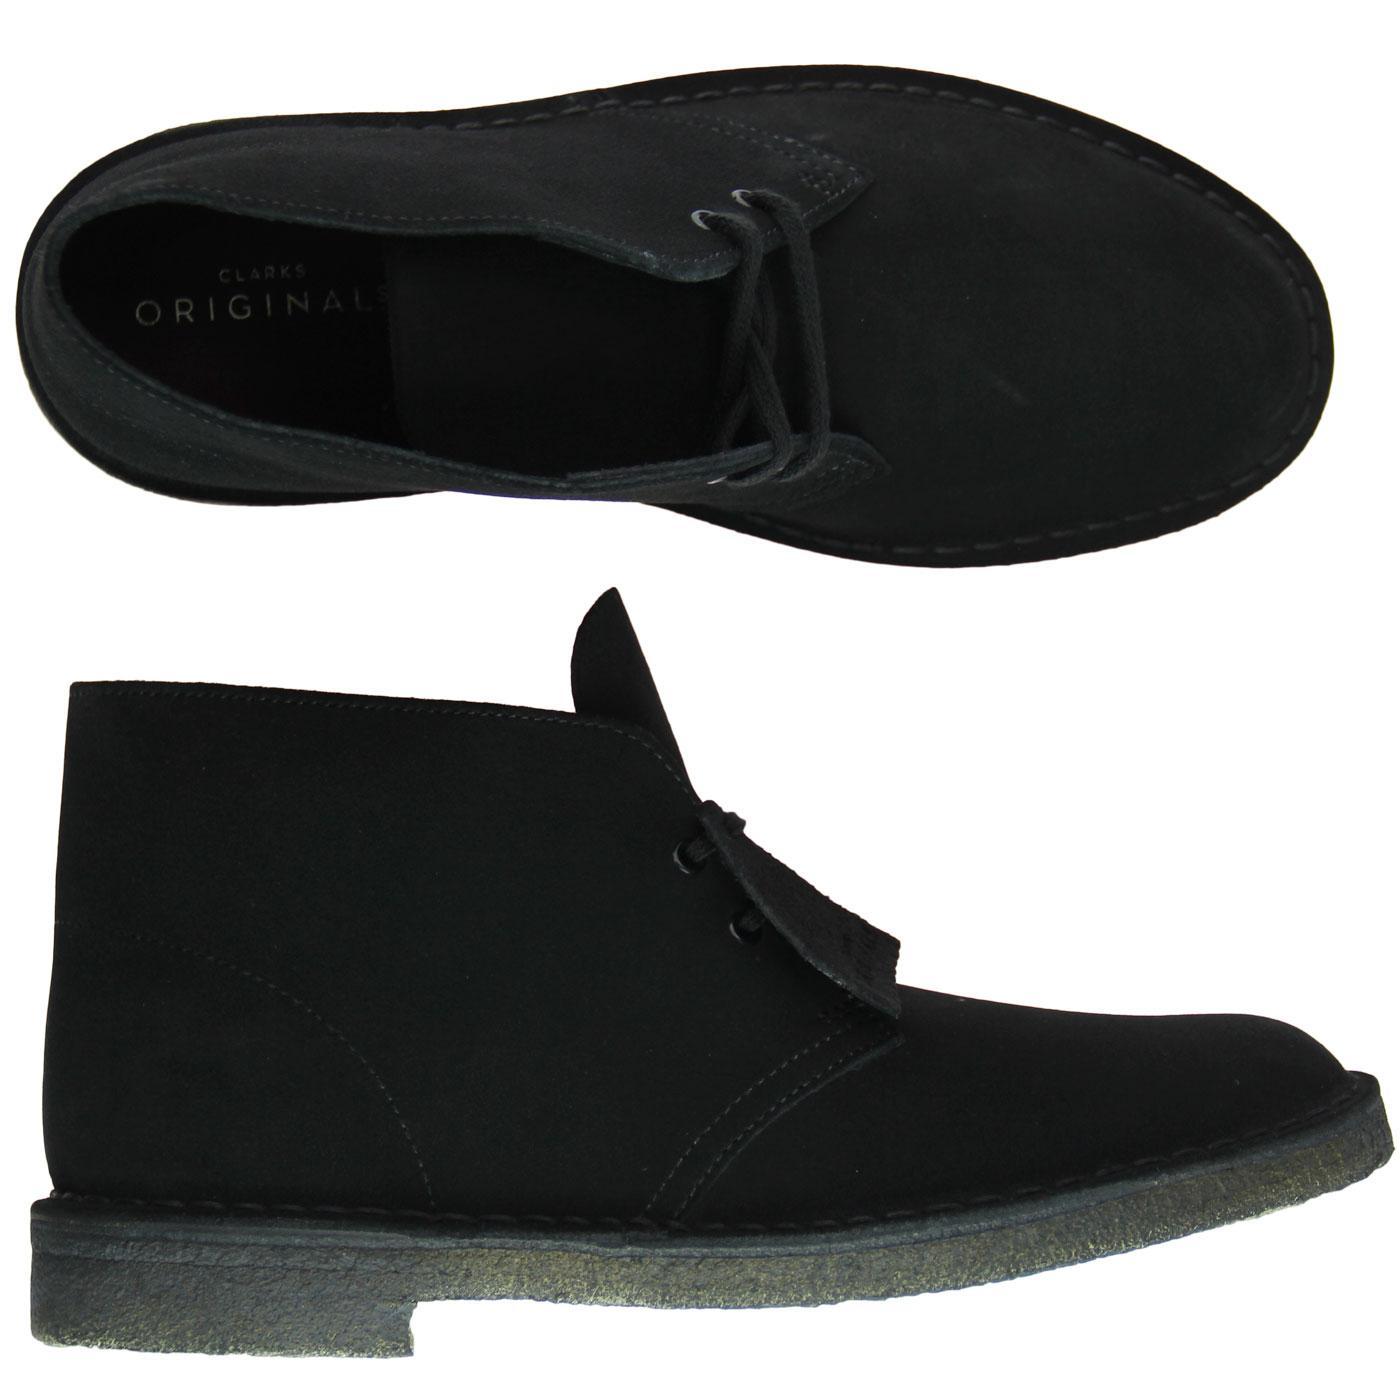 Clarks Originals Rambler | Mens Shoes & Footwear | Clarks